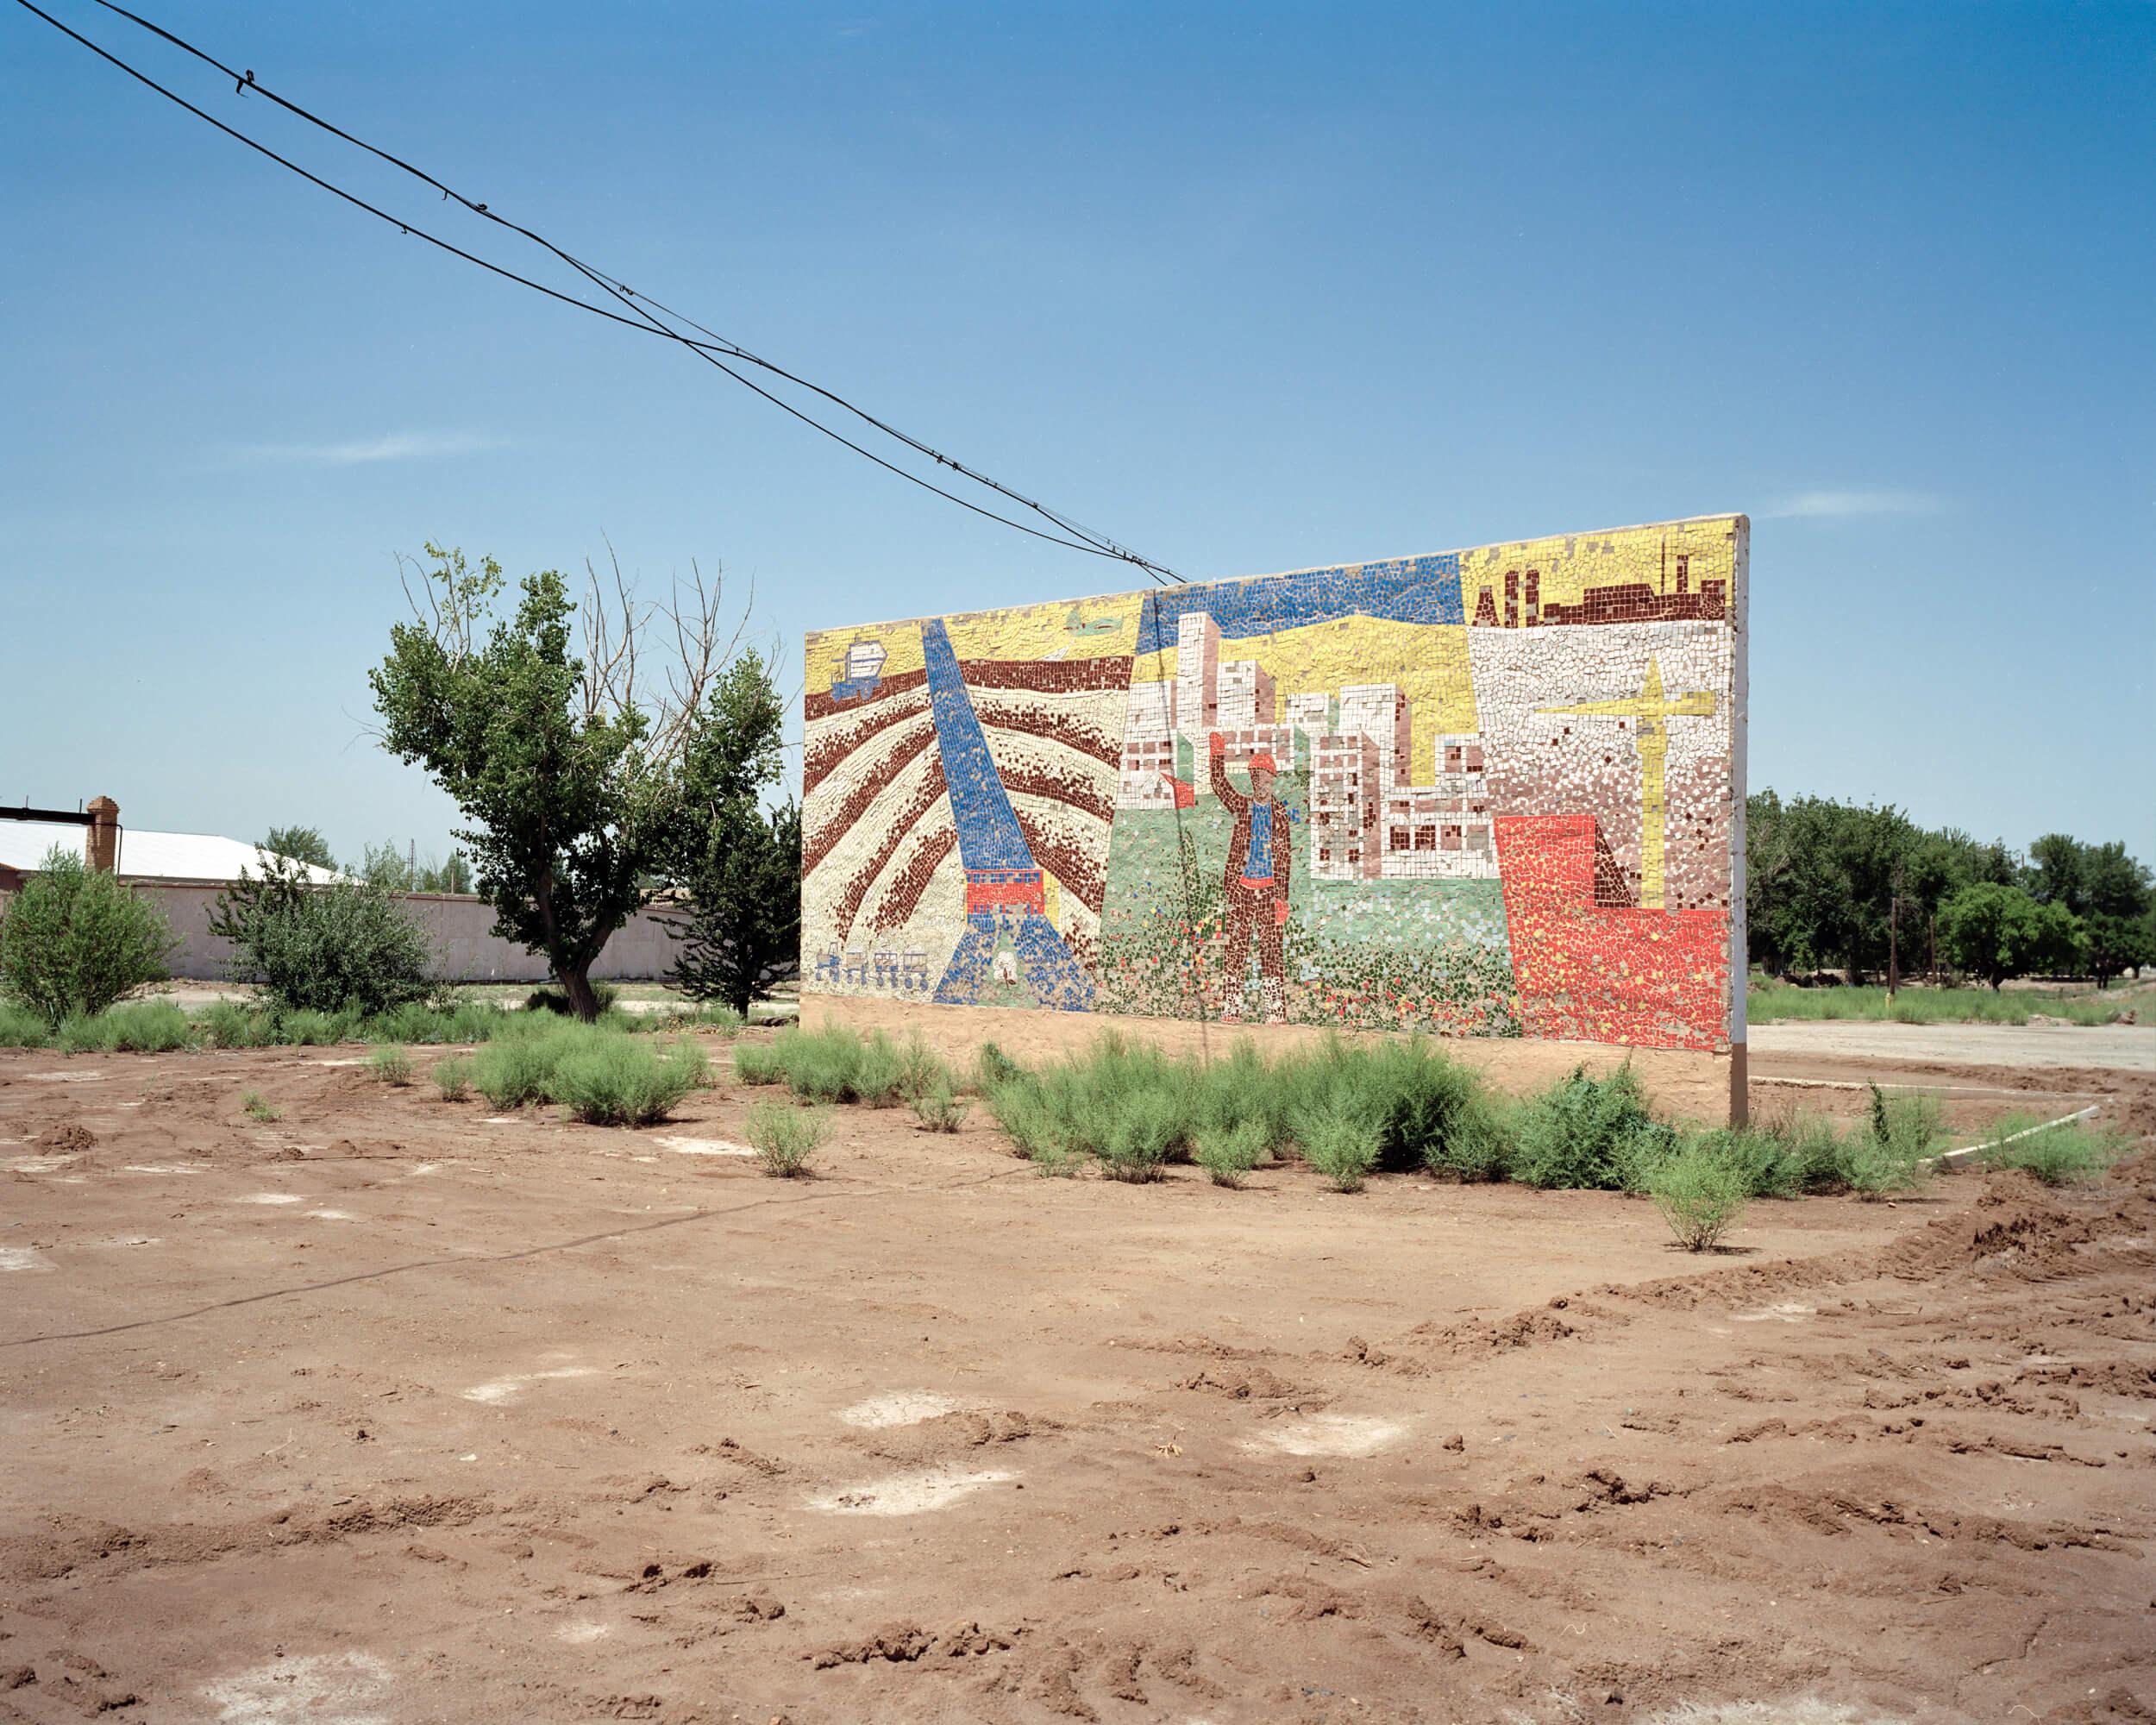 marco-barbieri-water-in-the-desert-2.jpg